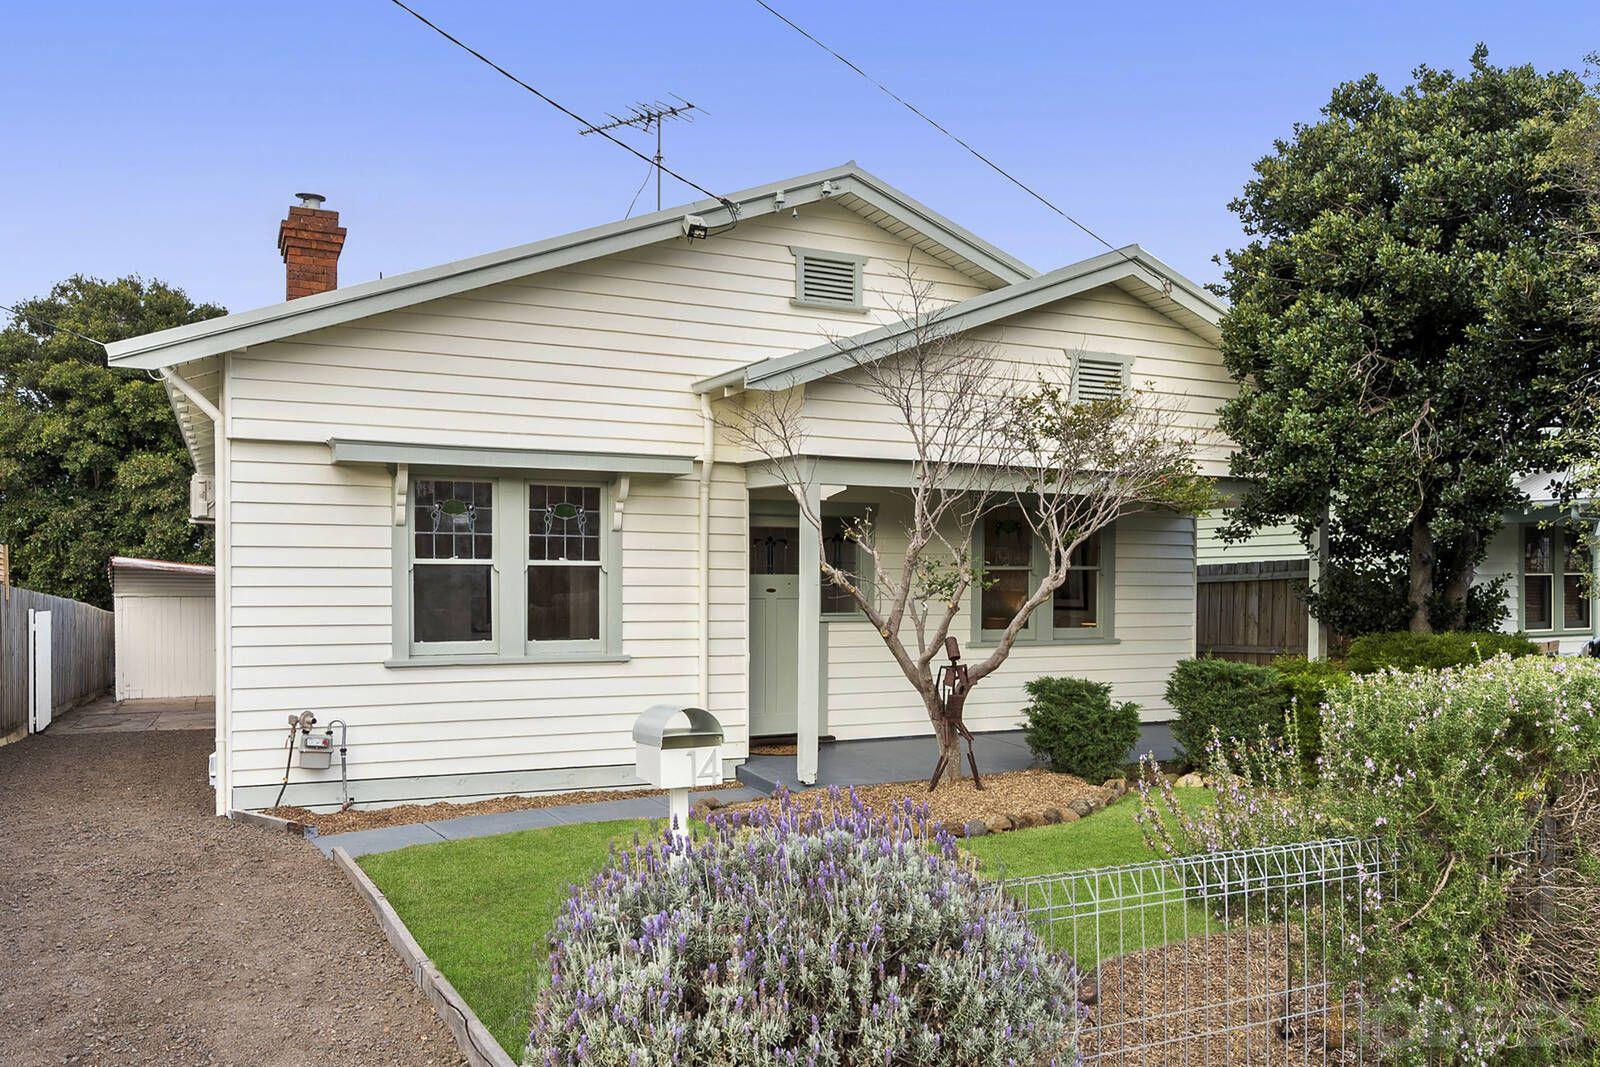 14 Craddock Street, North Geelong VIC 3215, Image 0